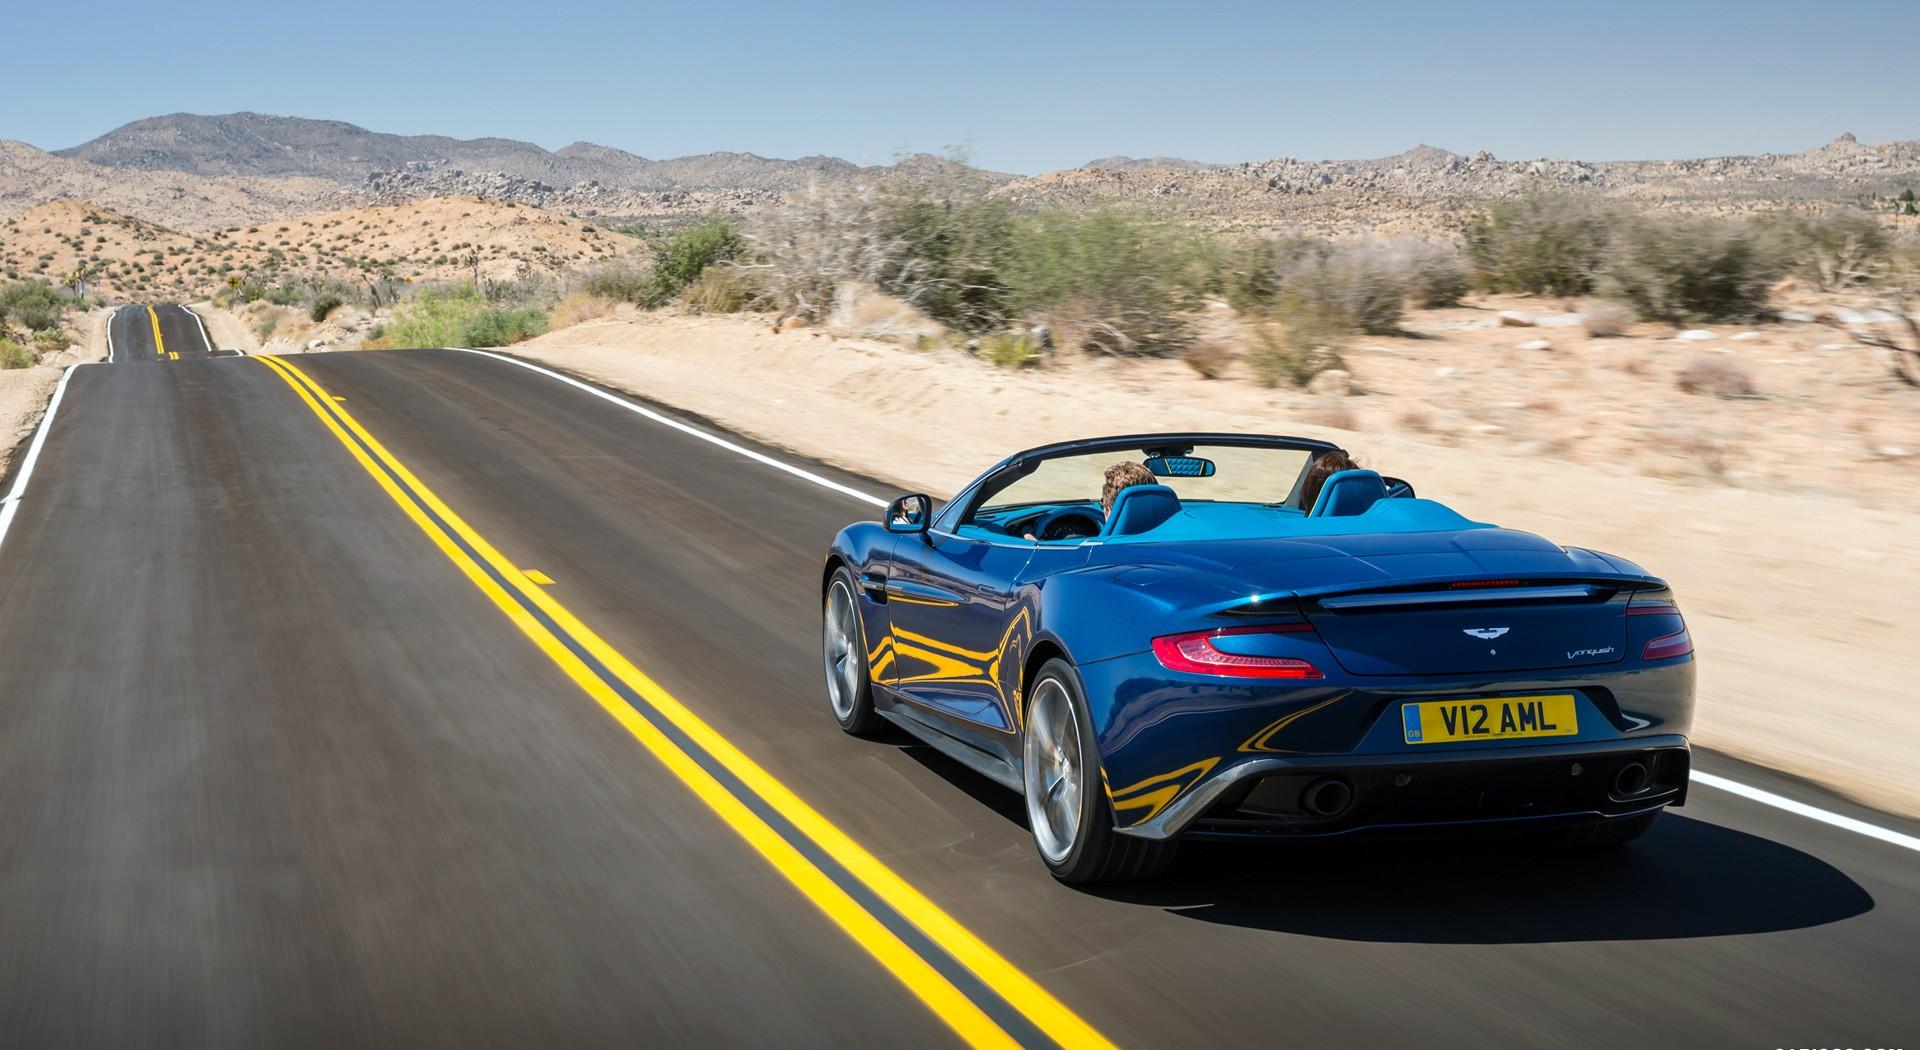 Aston Martin Vanquish splendid